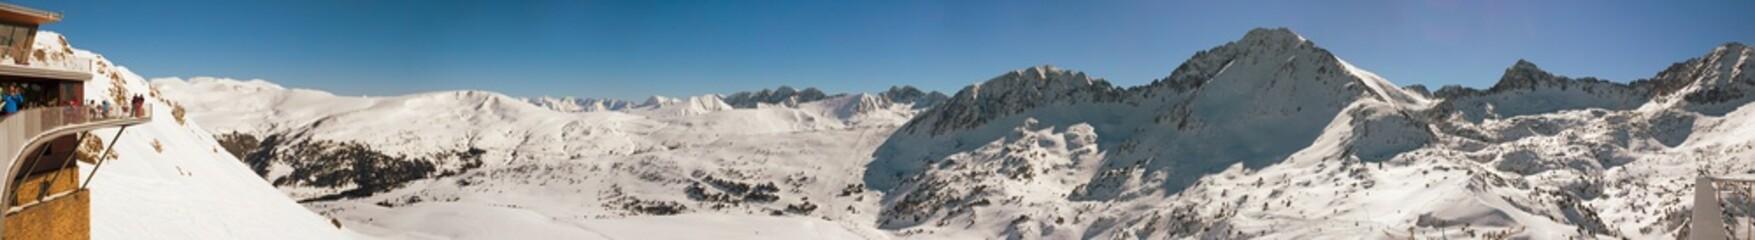 PYRENEES, ANDORRA - FEBRUARY 9, 2017: Panorama of alpine skiing slopes in Andorra